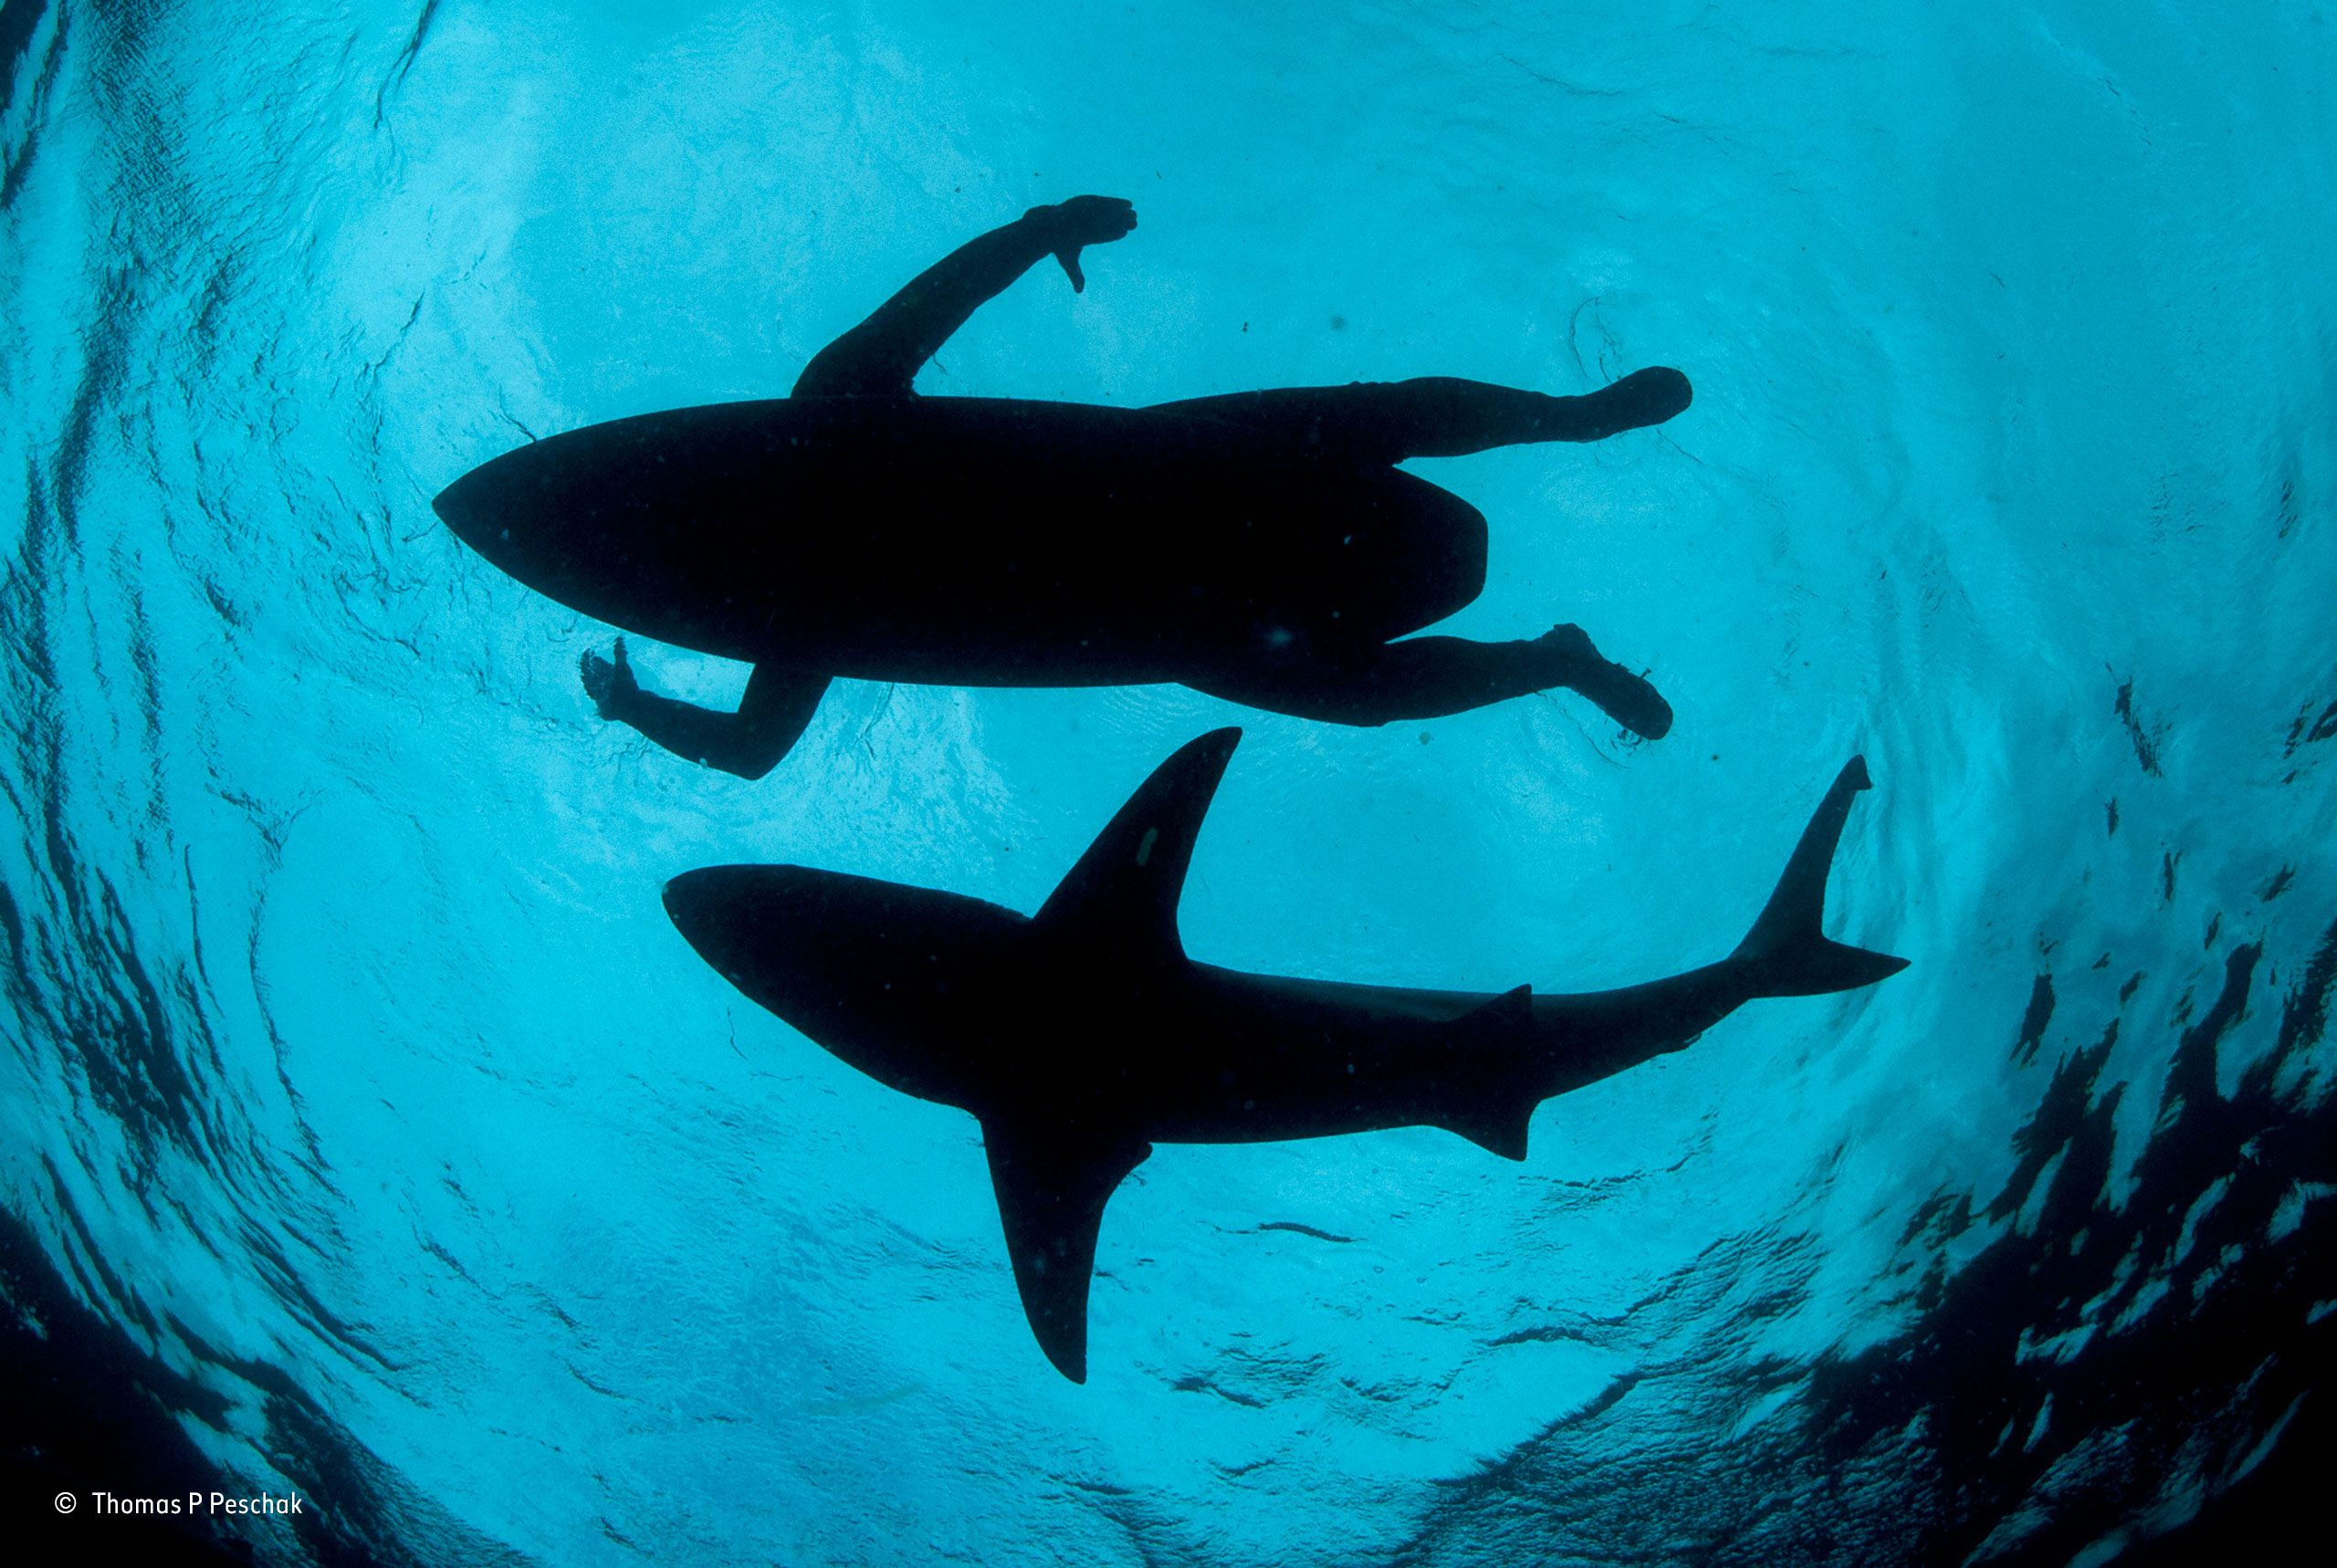 The shark surfer